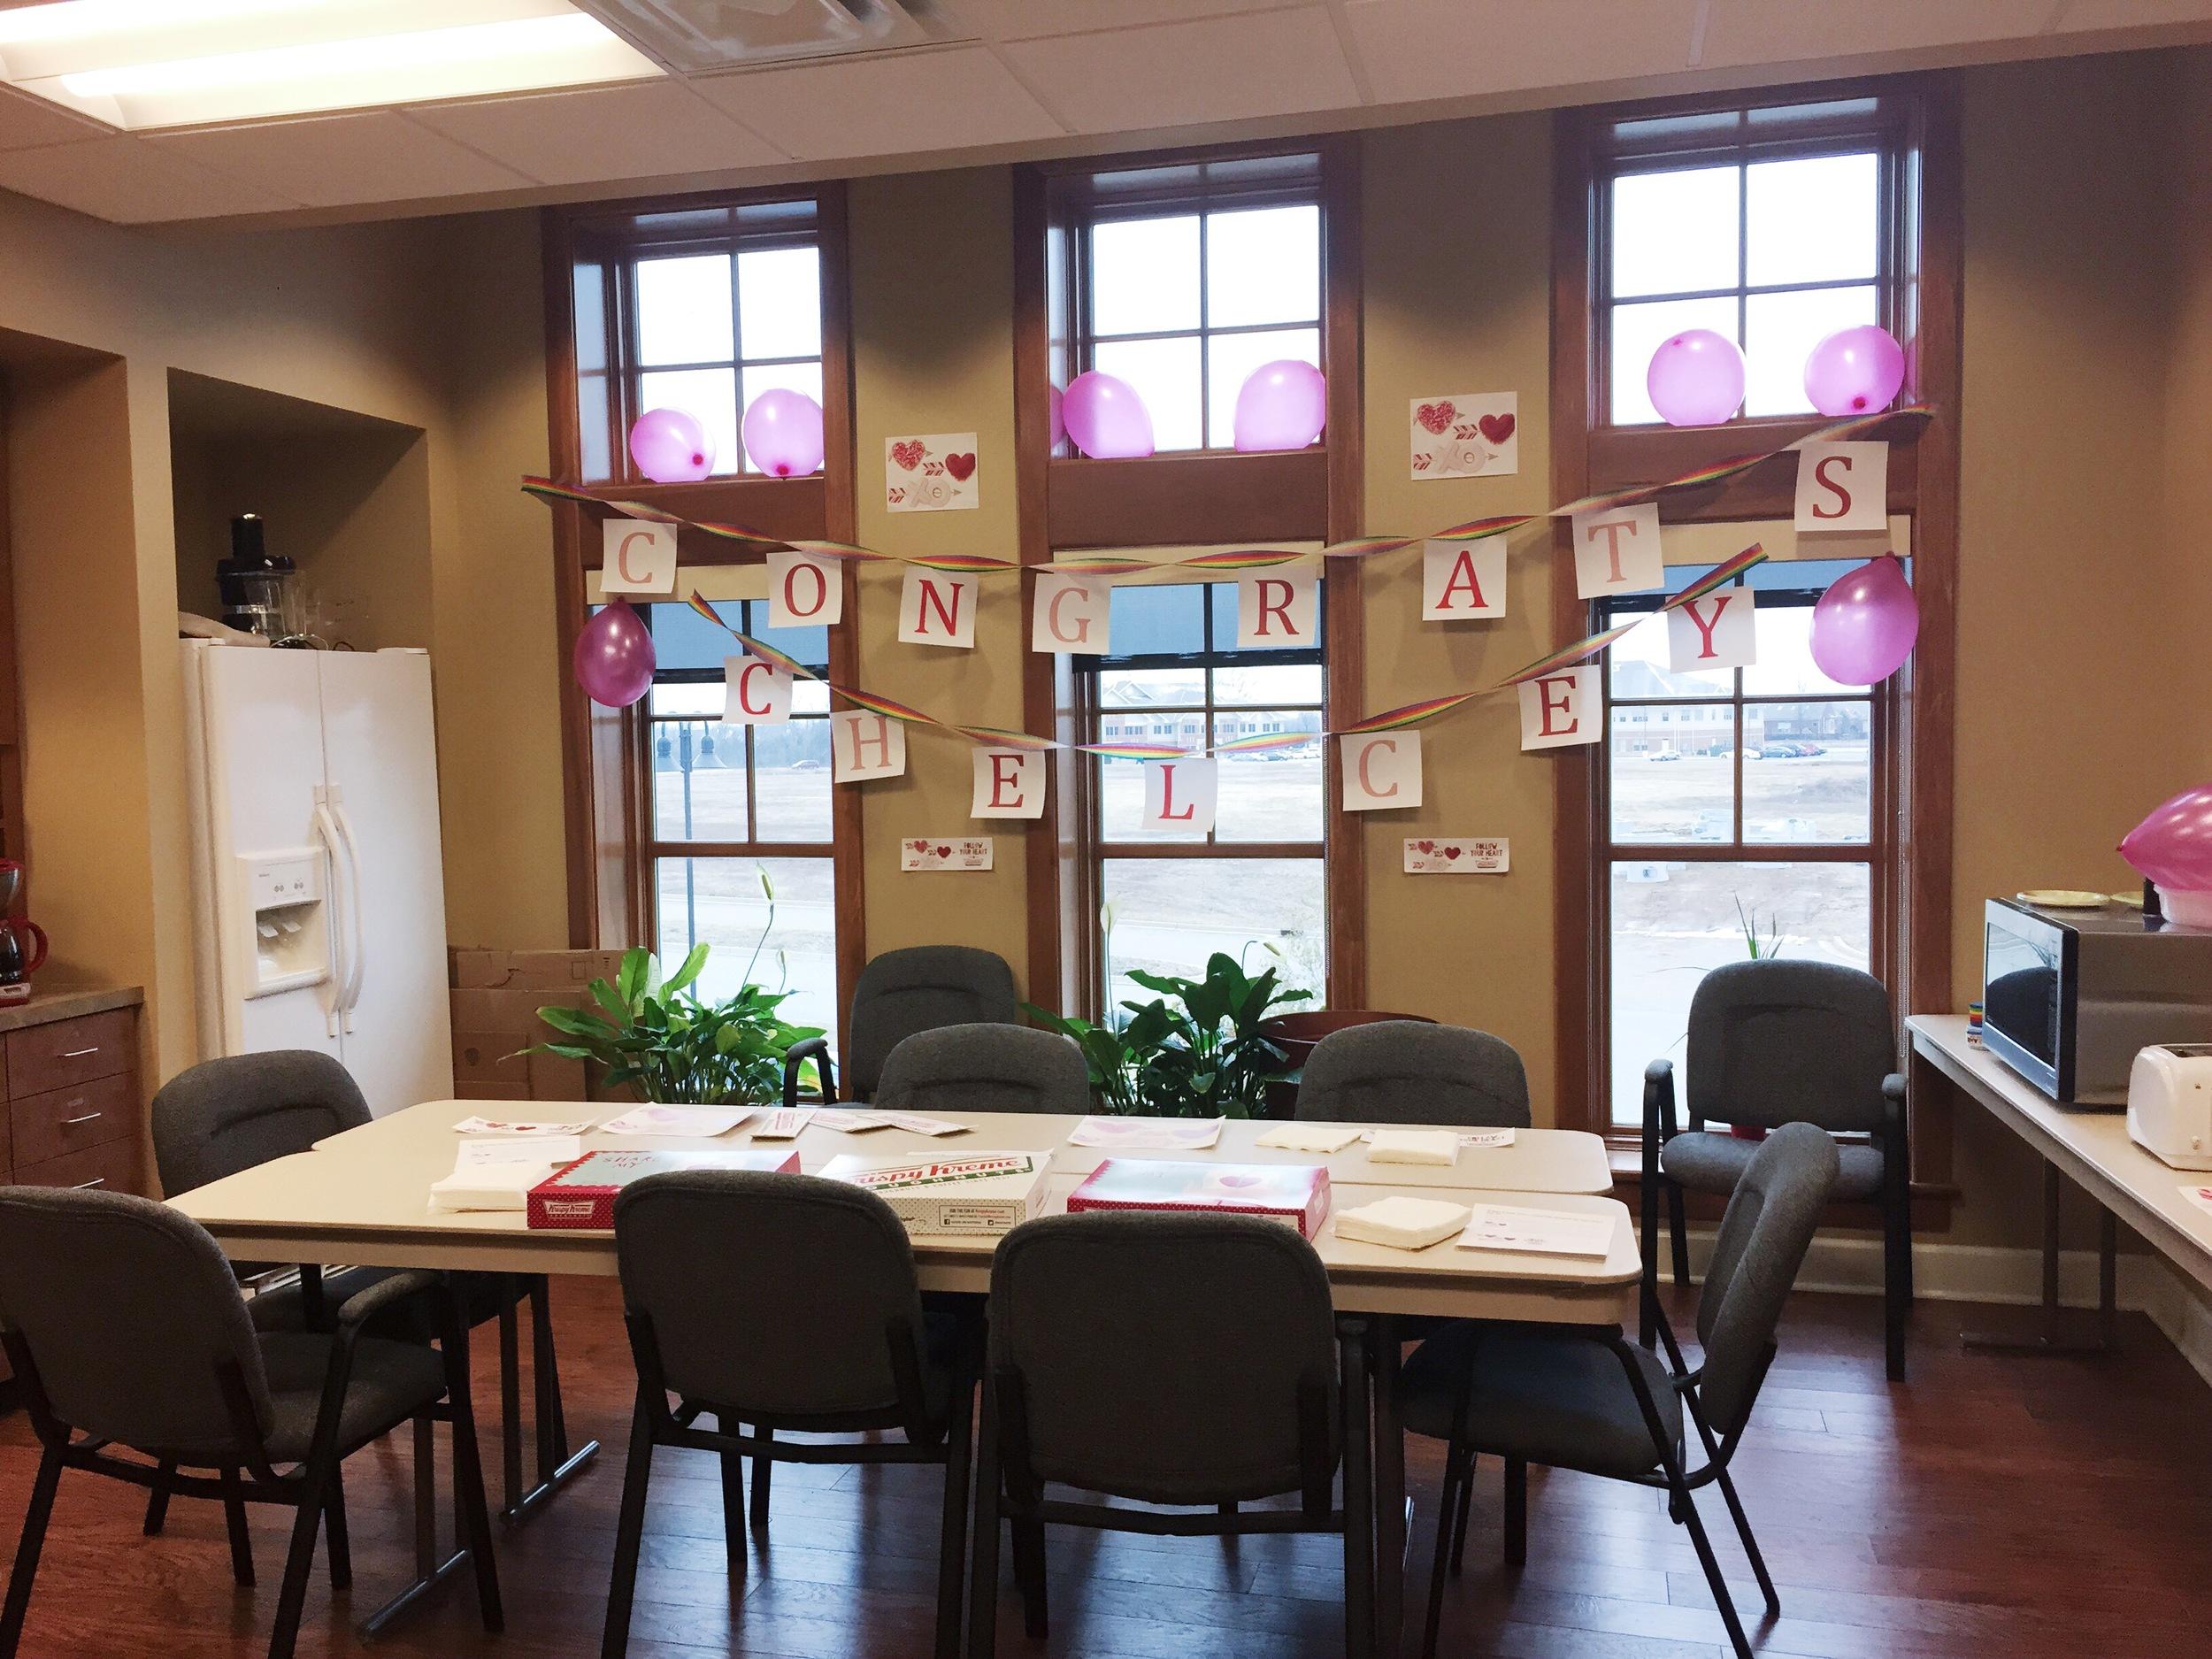 Surprise Office Party Krispy Kreme